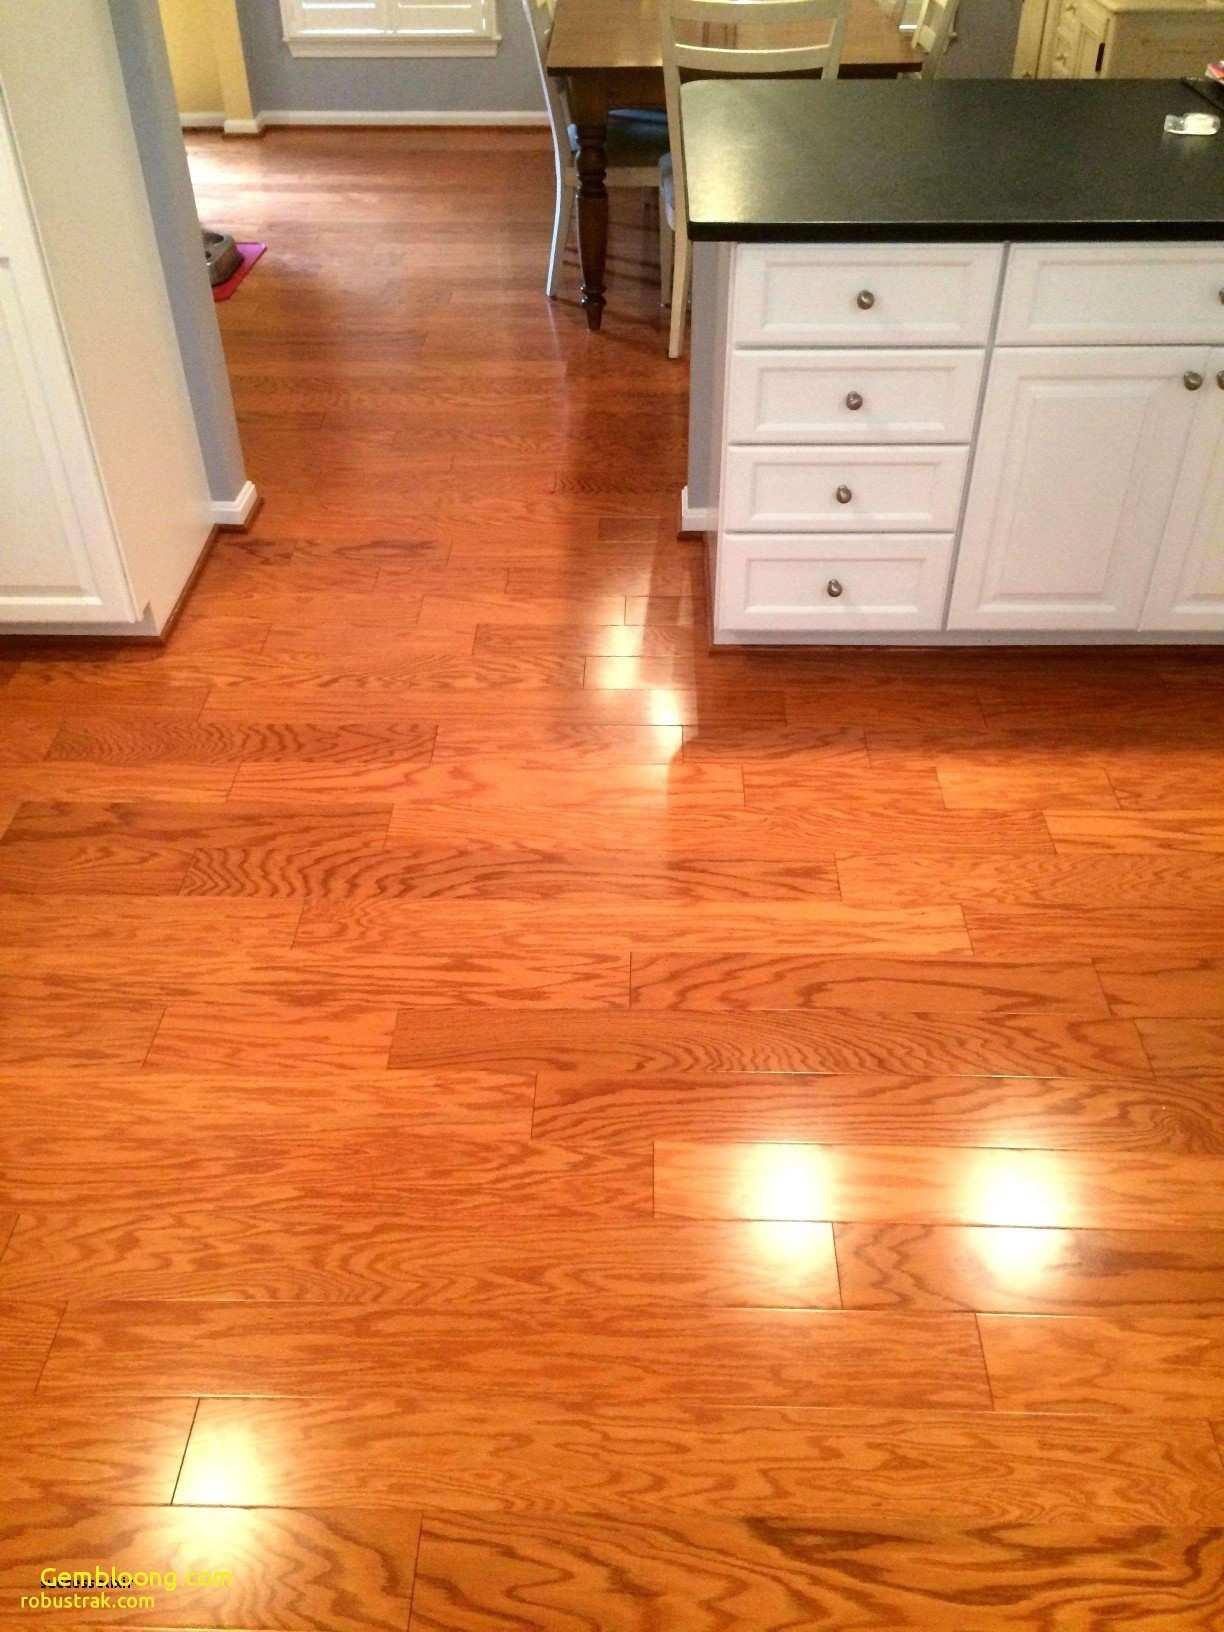 laminate flooring vs hardwood price of wood for floors facesinnature pertaining to hardwood floors in the kitchen fresh where to buy hardwood flooring inspirational 0d grace place barnegat